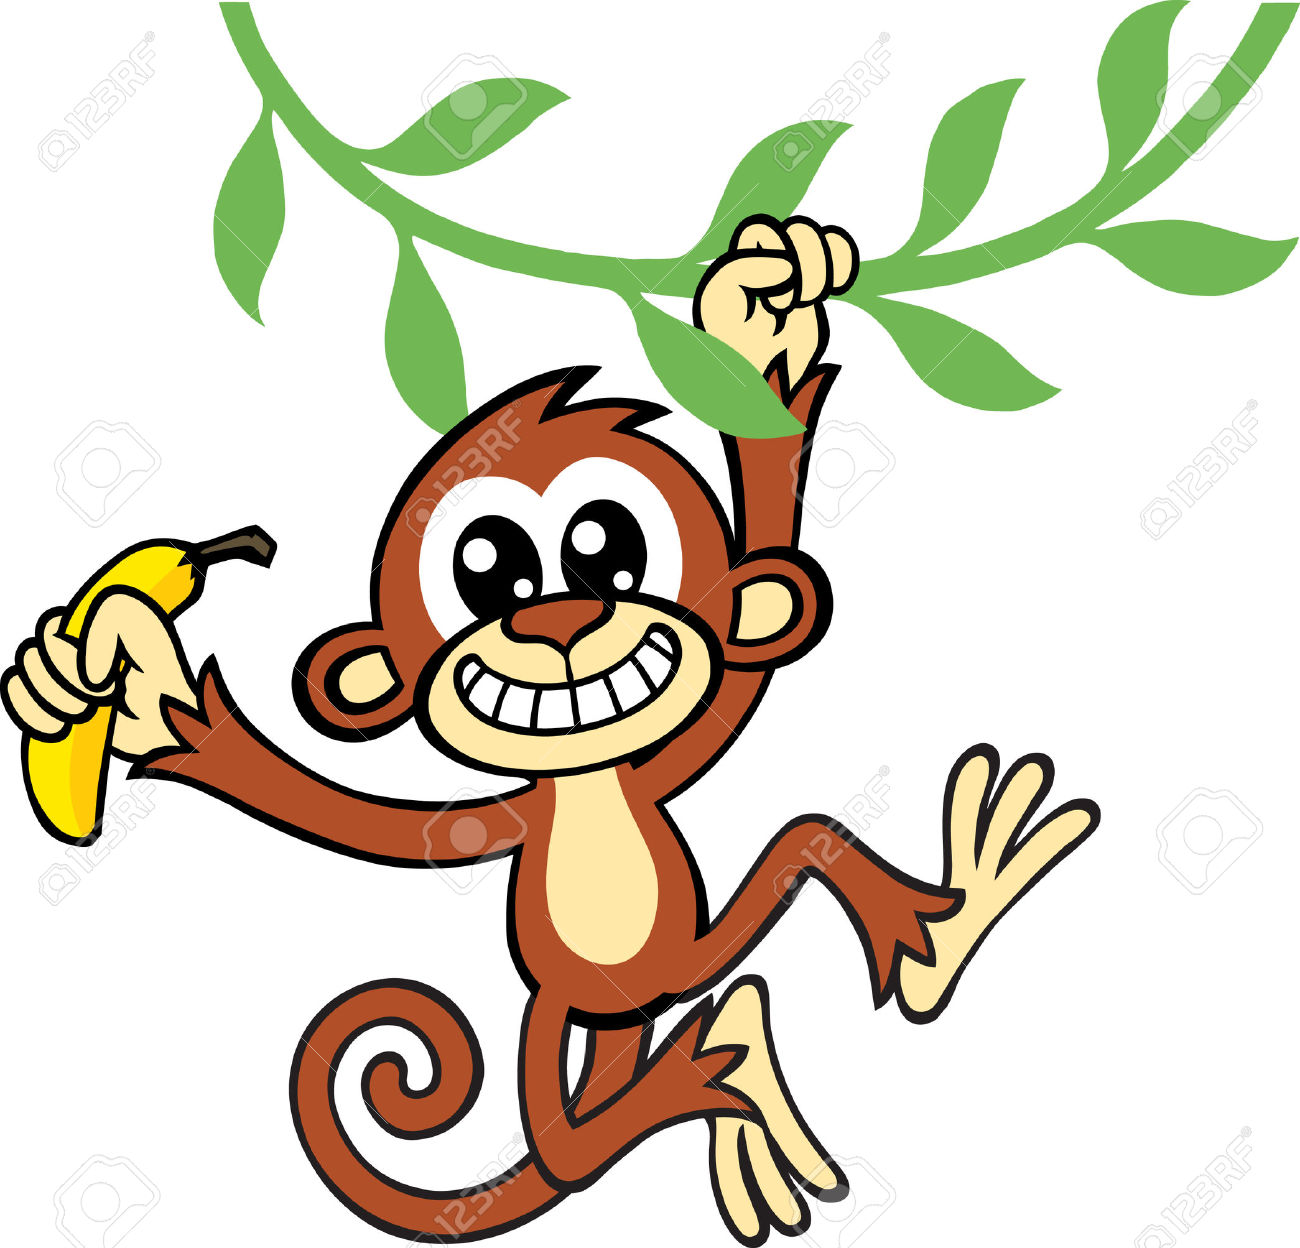 Monkey on vine clipart image royalty free download Free Monkey Clipart   Free download best Free Monkey Clipart ... image royalty free download